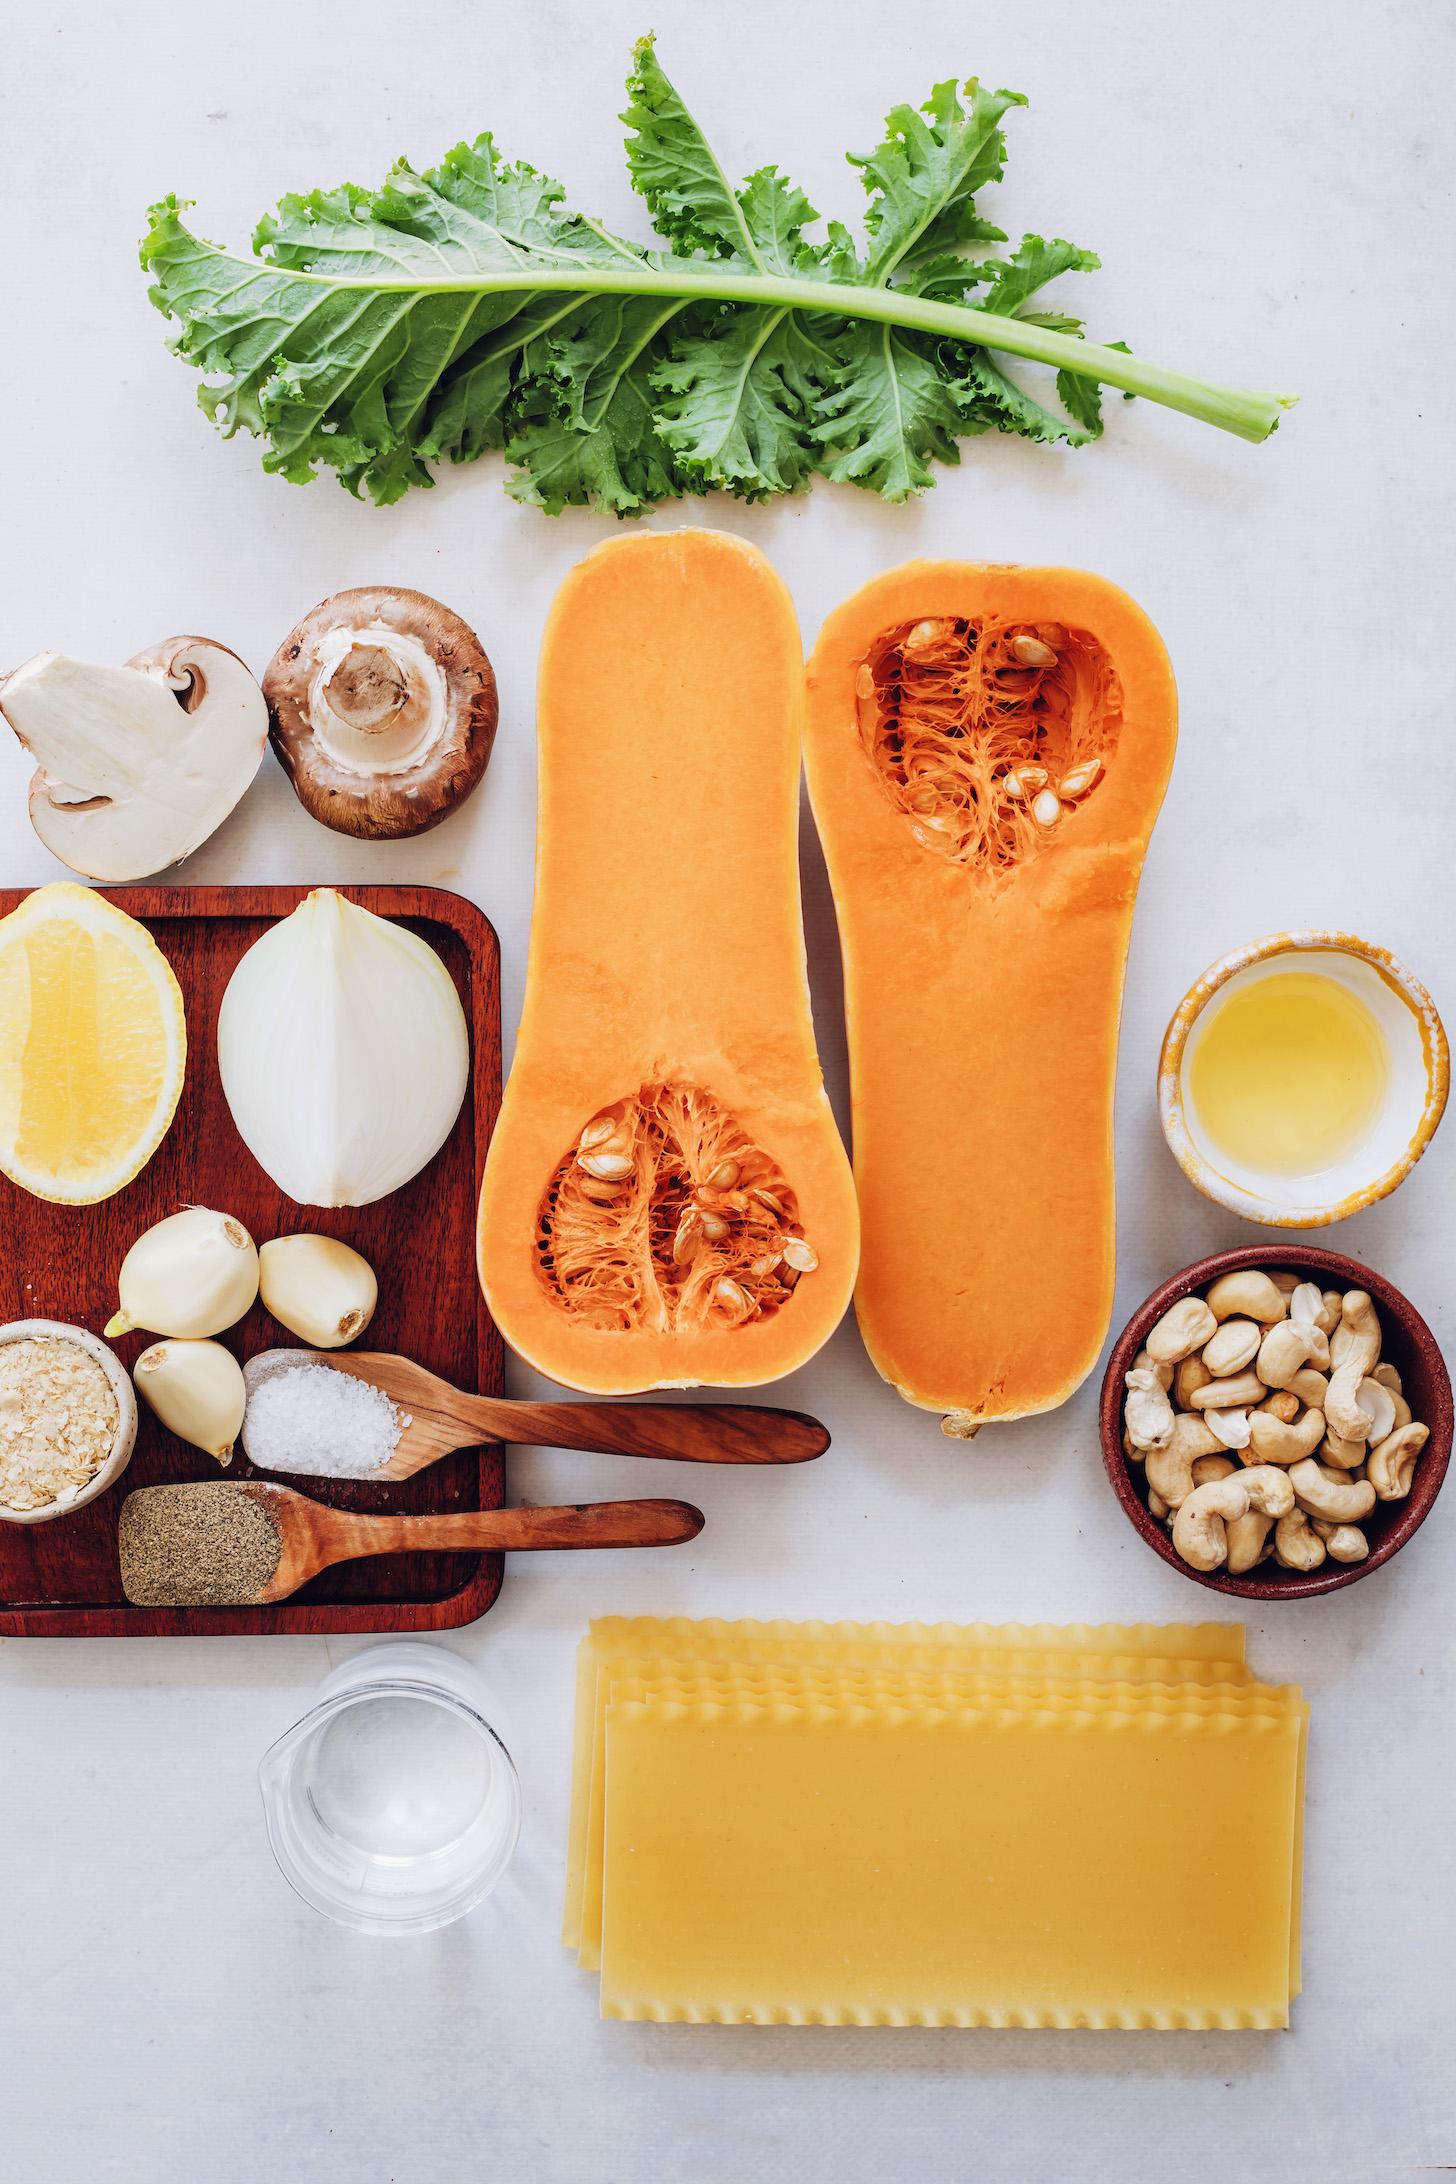 Kale, mushrooms, butternut squash, garlic, salt, pepper, nutritional yeast, lemon, water, lasagna noodles, cashews, and olive oil